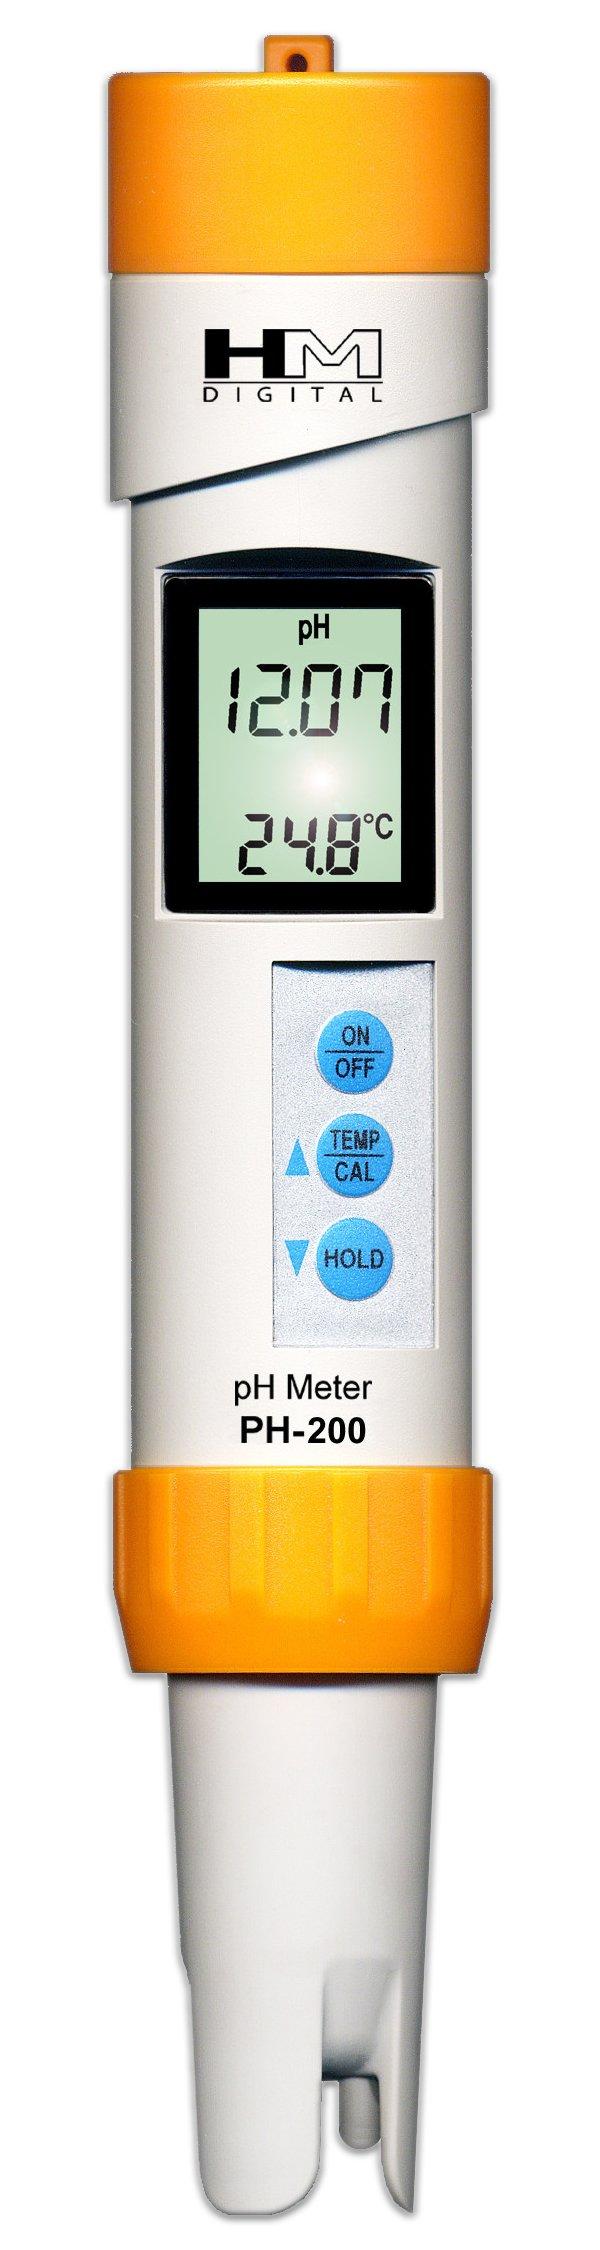 HM Digital PH-200 Waterproof Temperature PH Meter, 3.3'' x 8.5'' x 2'', White by HM Digital